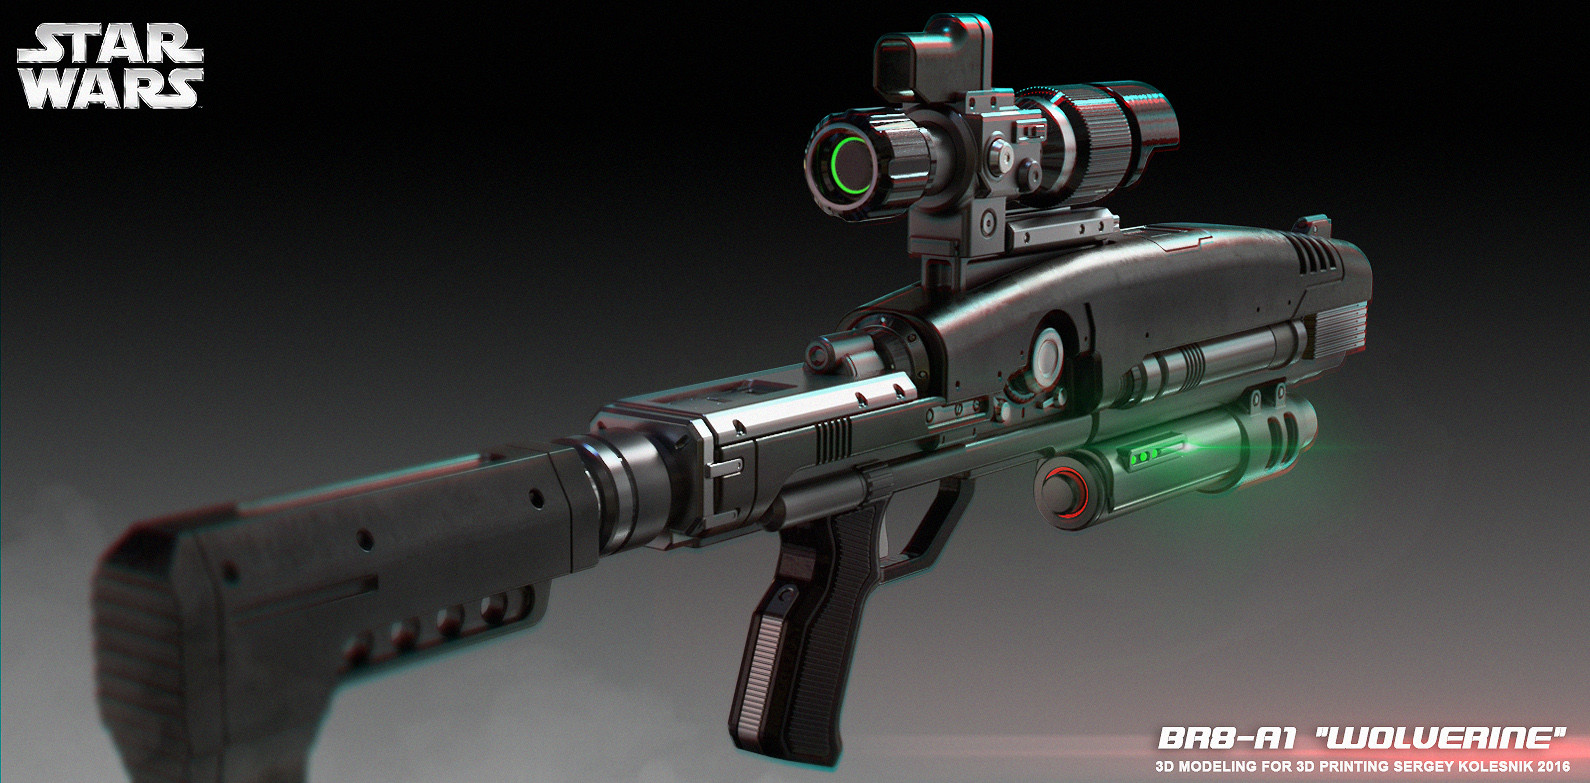 ArtStation - BR8-A1 Wolverine Blaster Rifle 3D print model, Sergey